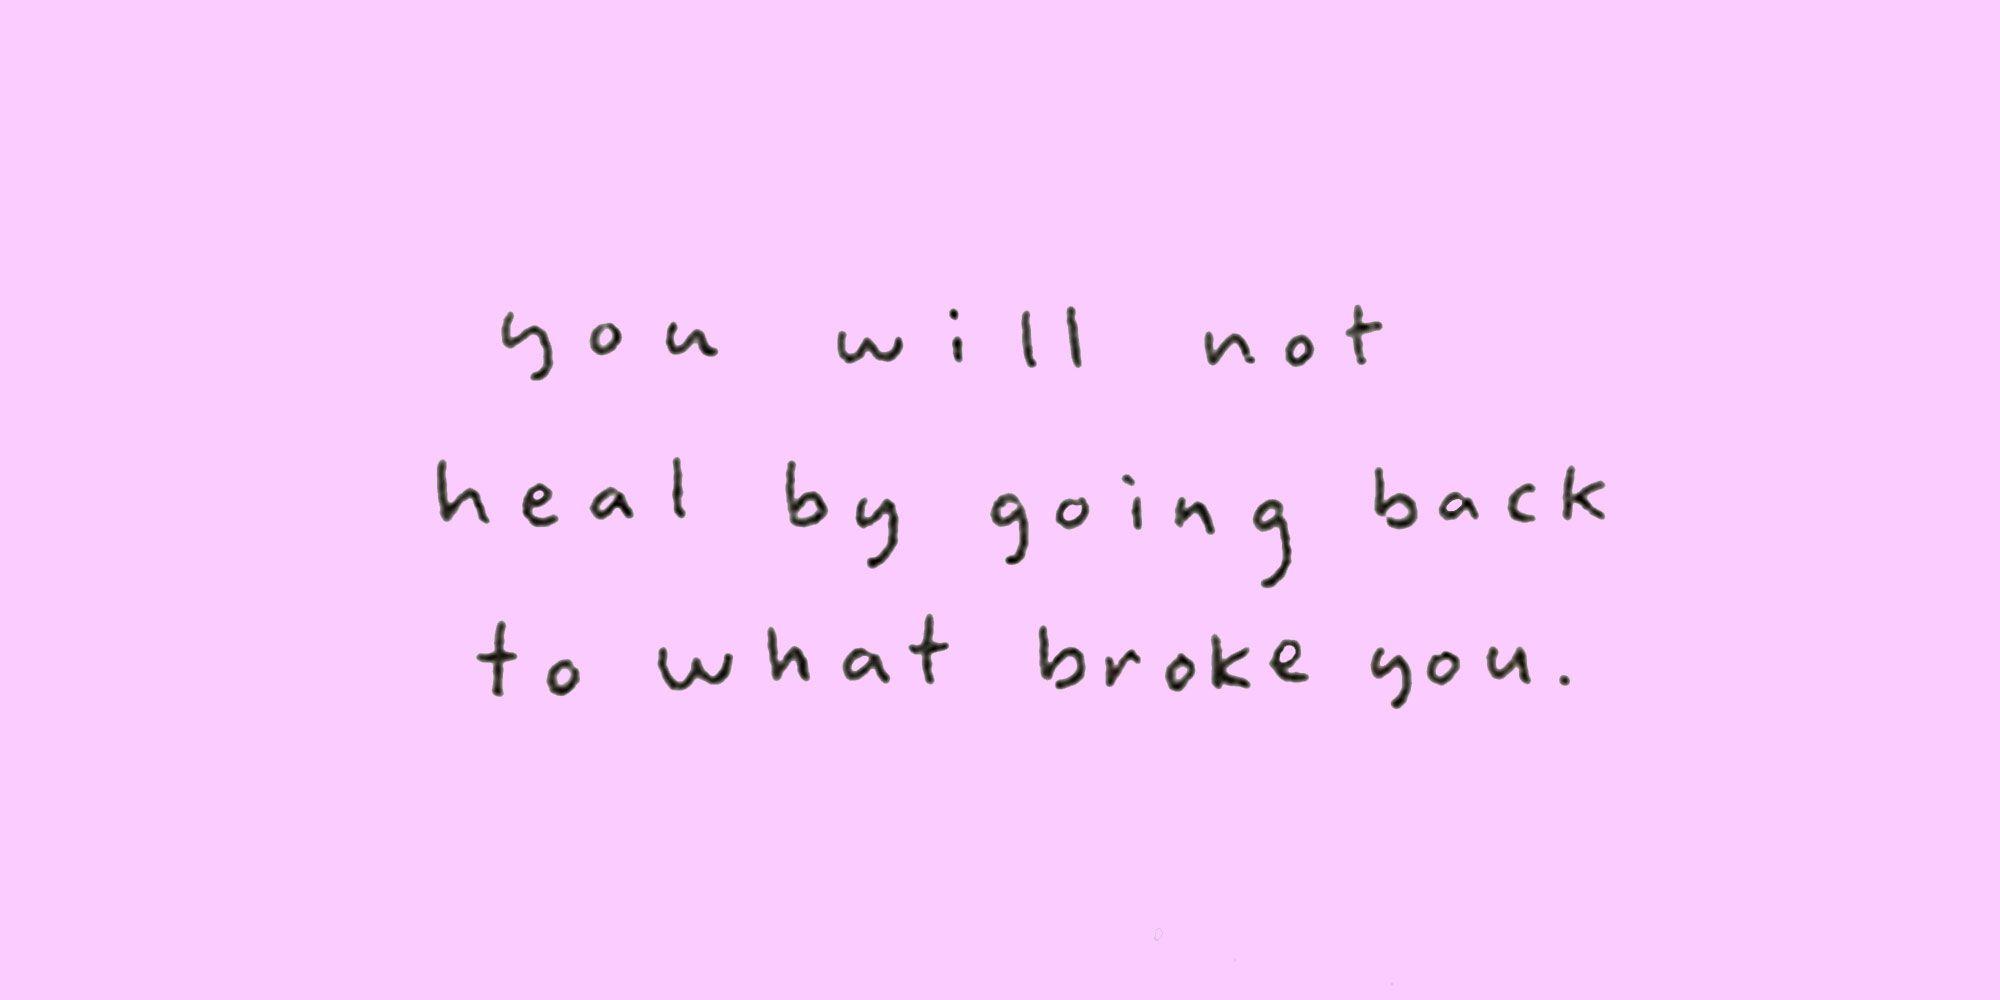 Breakup Quotes 23 break up quotes   Inspiring quotes to get you through a break up Breakup Quotes